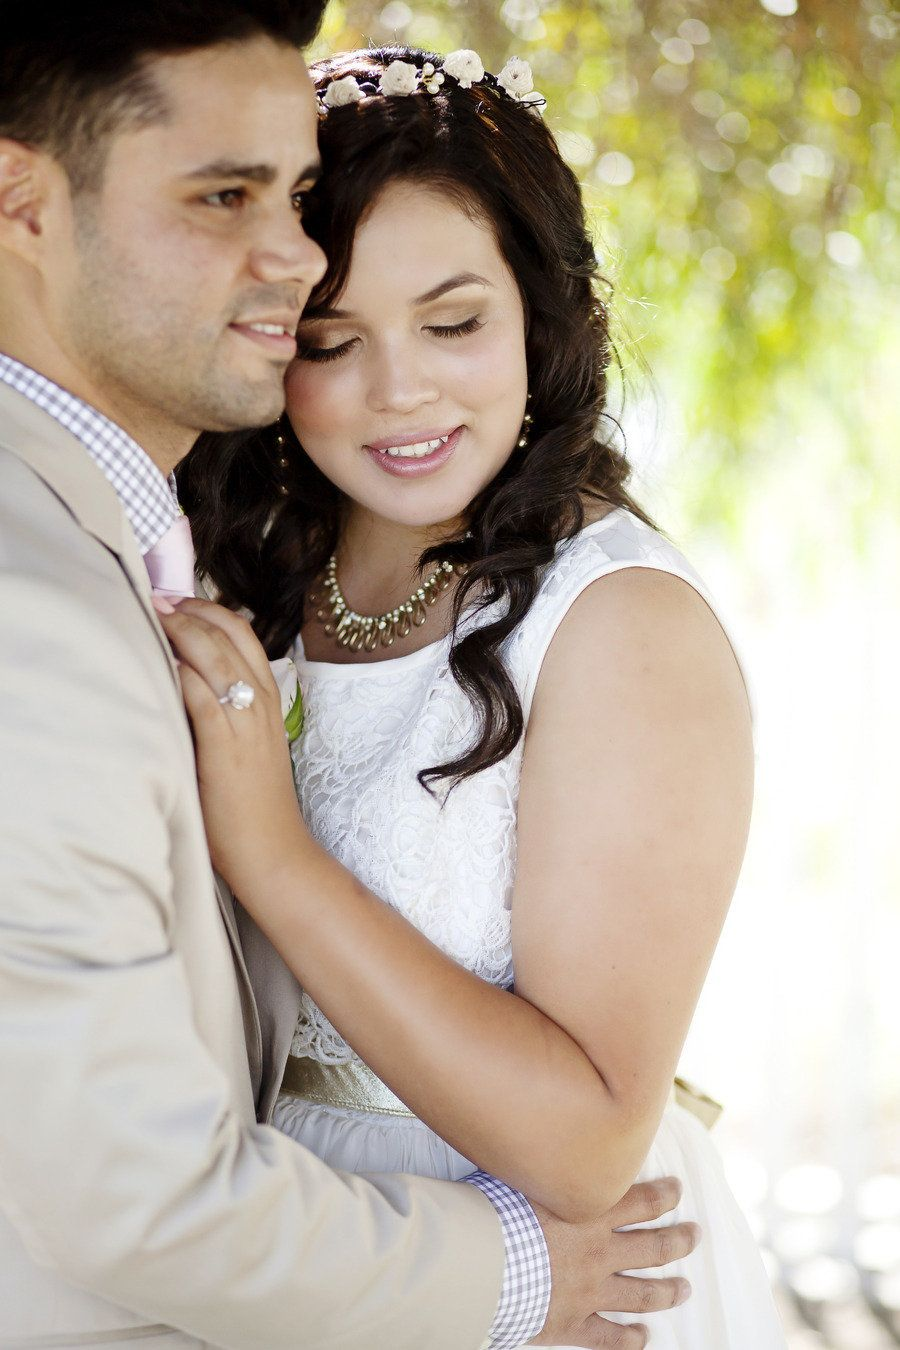 Huntington beach wedding at newland barn from cory kendra